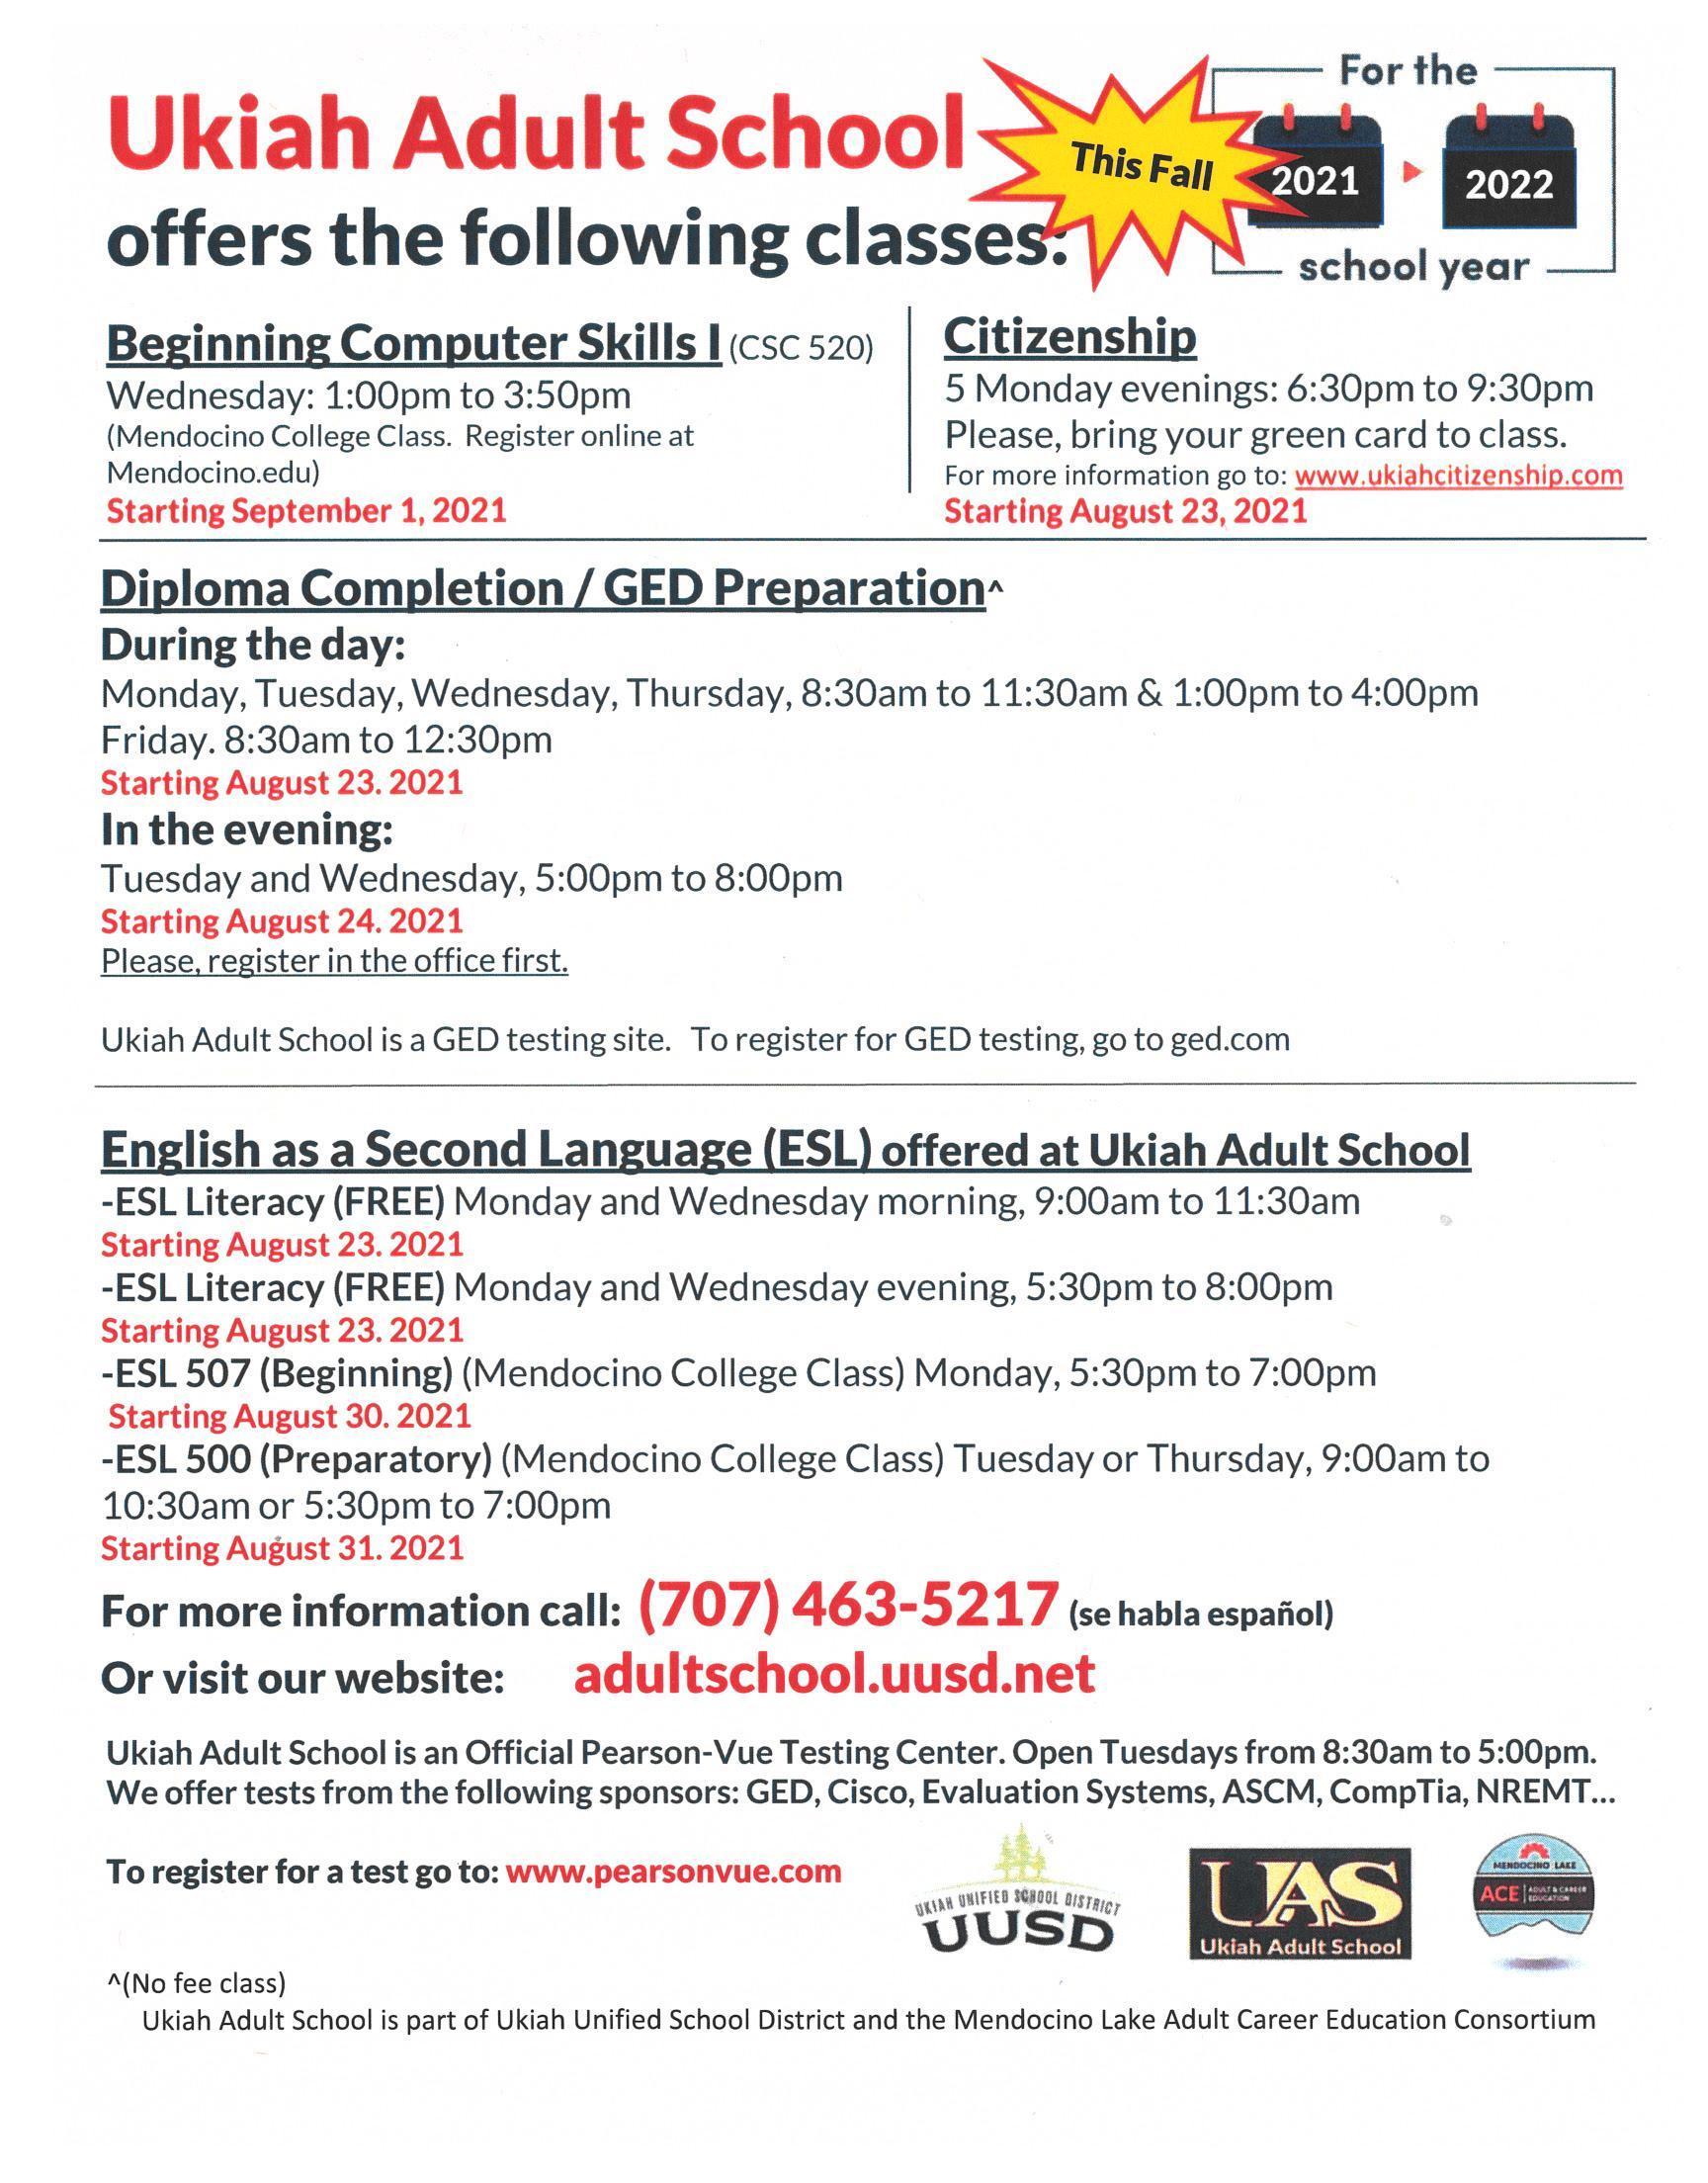 Ukiah Adult School Fall 2021 course list poster